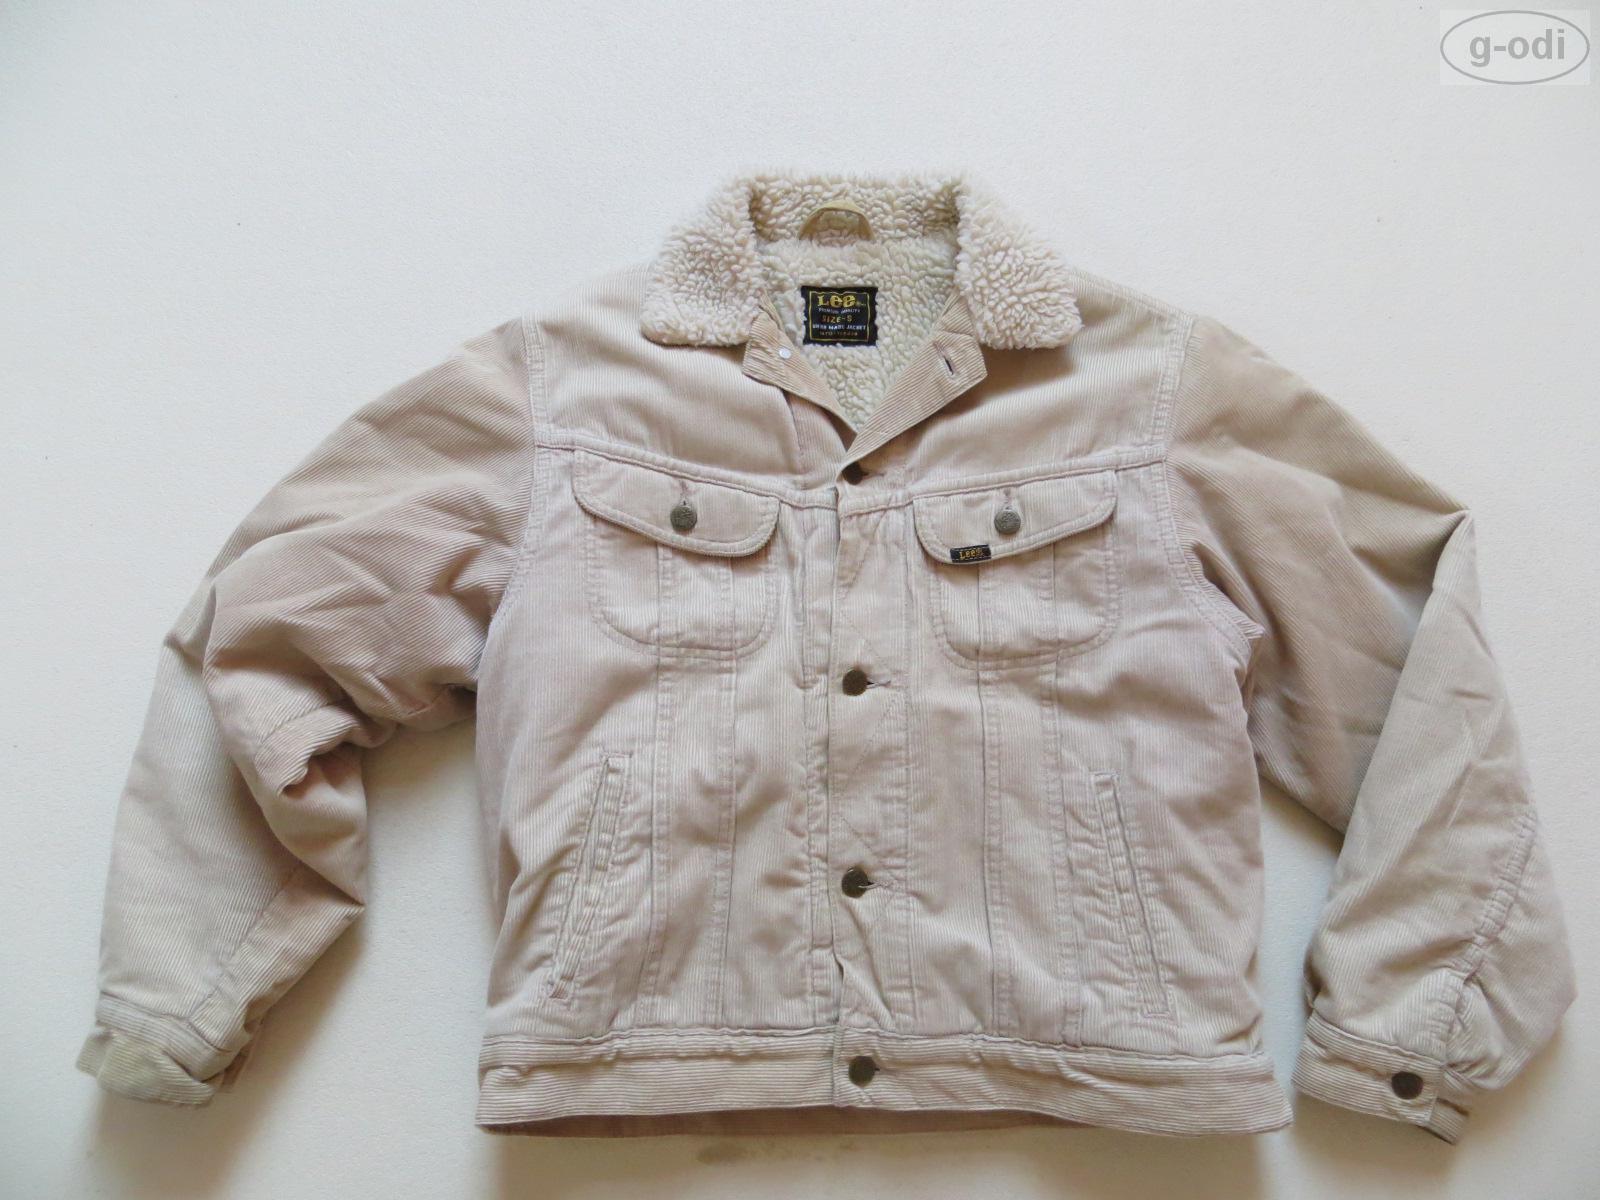 lee cord jeans jacke mit teddy fell gr s beige. Black Bedroom Furniture Sets. Home Design Ideas